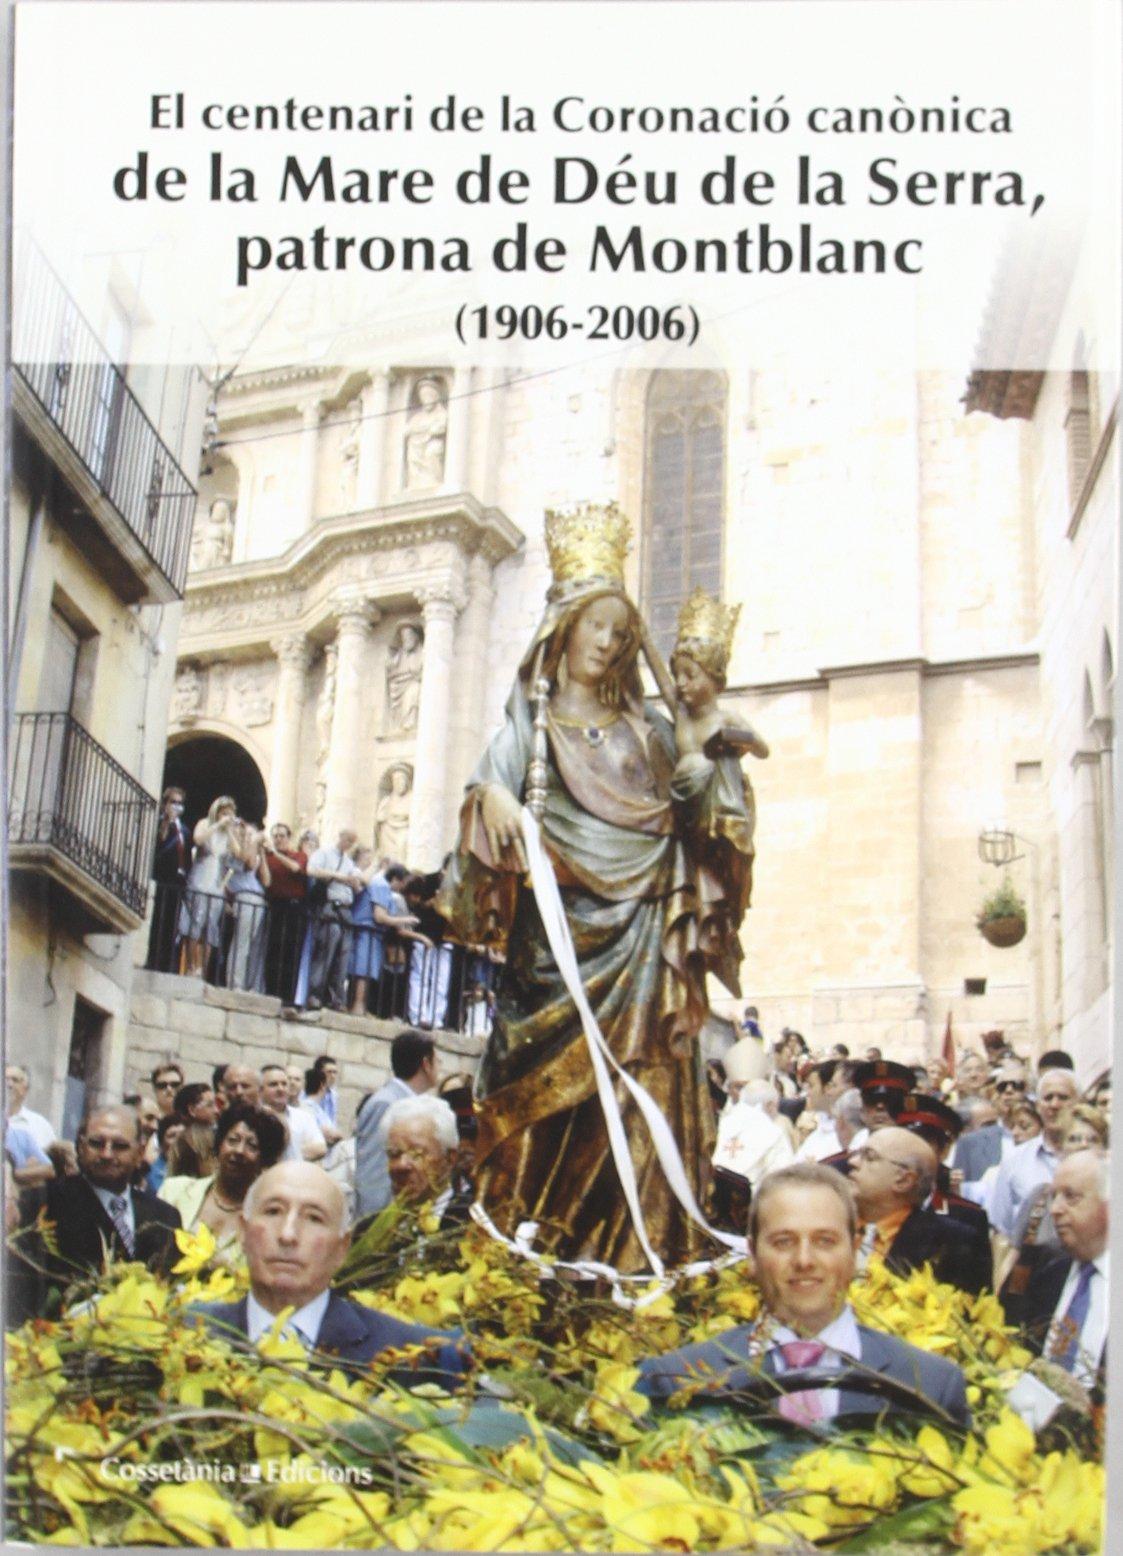 La Mare de Déu de la Serra – Santuari de la Mare de Déu de la Serra